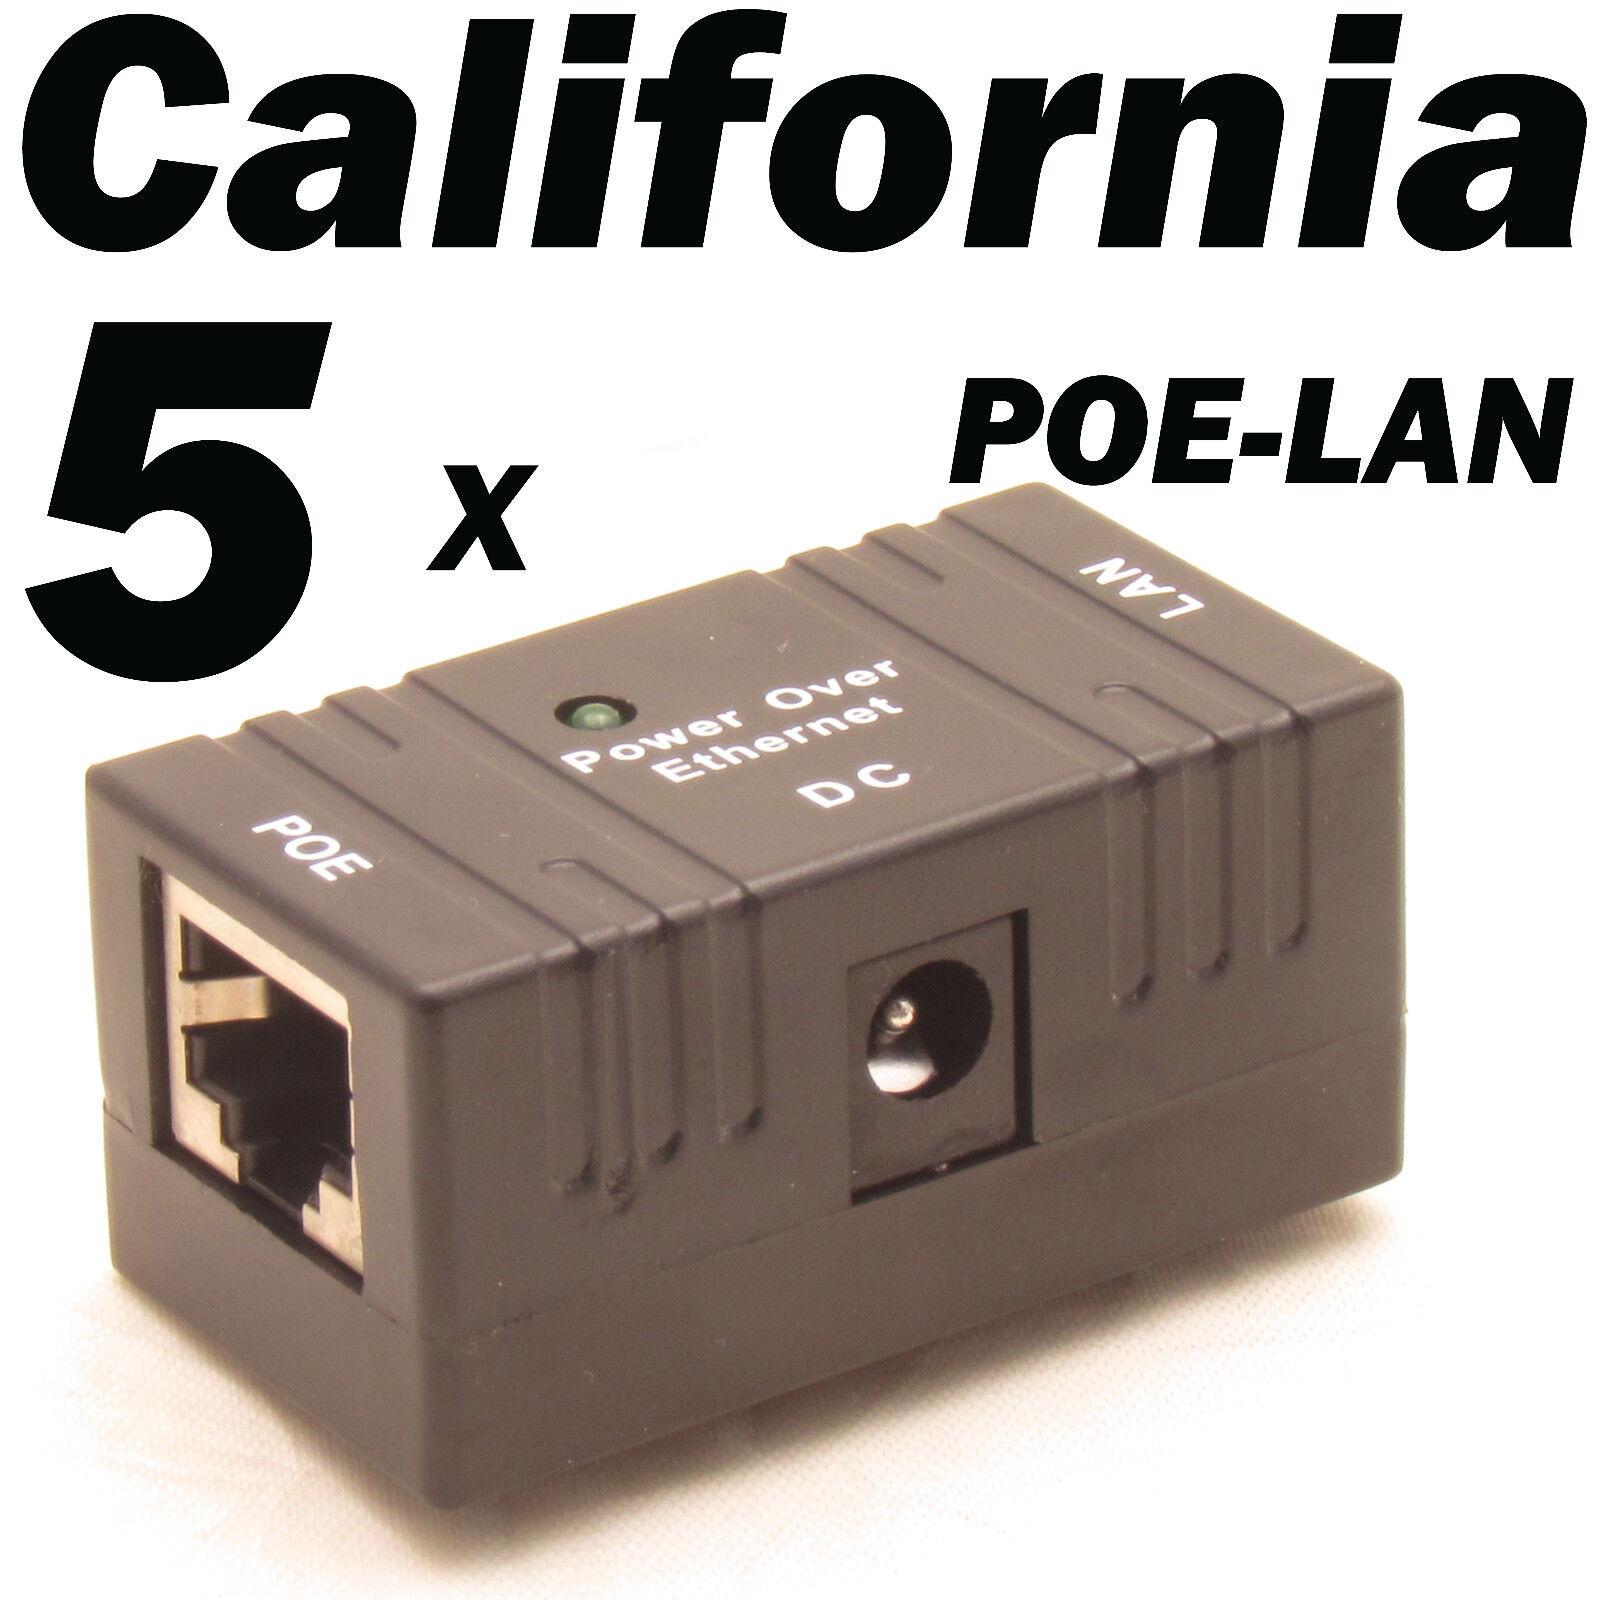 Passive PoE Injector Splitter over Ethernet Adapter For LAN Network IP Camera